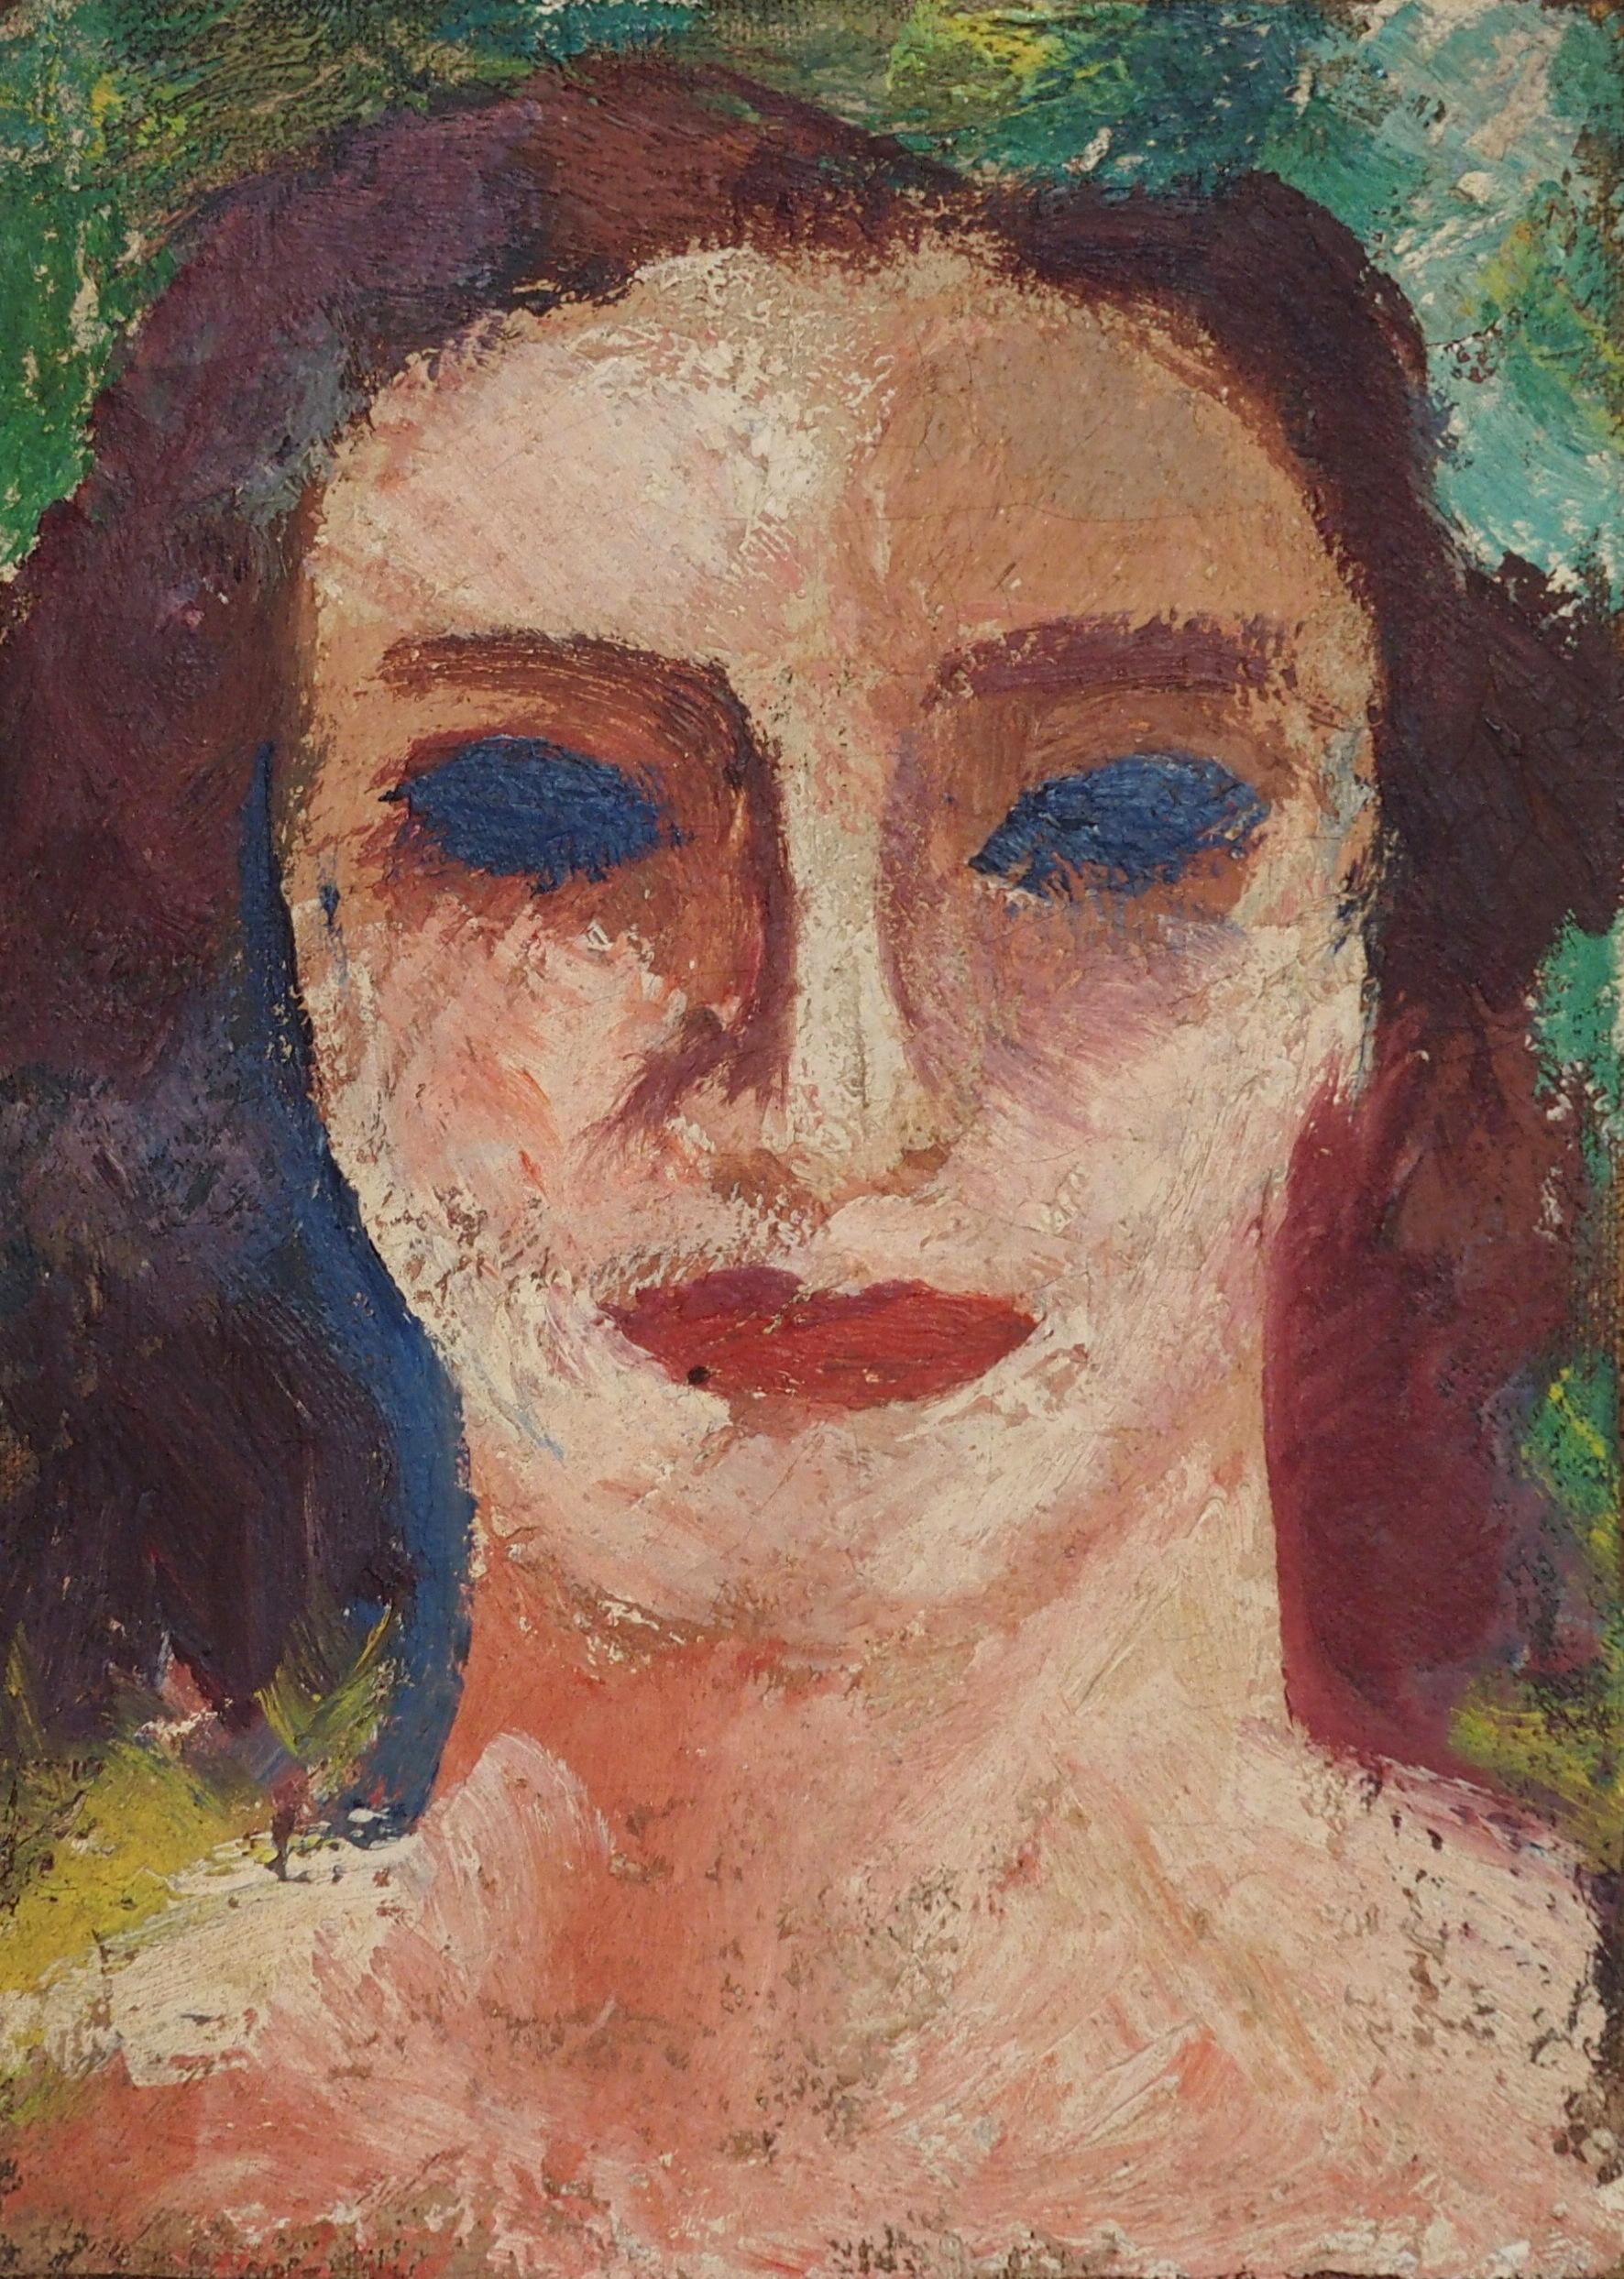 •DONALD BAIN (SCOTTISH 1904-1979) HEAD STUDY oil on canvas laid on panel board, 19.5 x 14cm signed